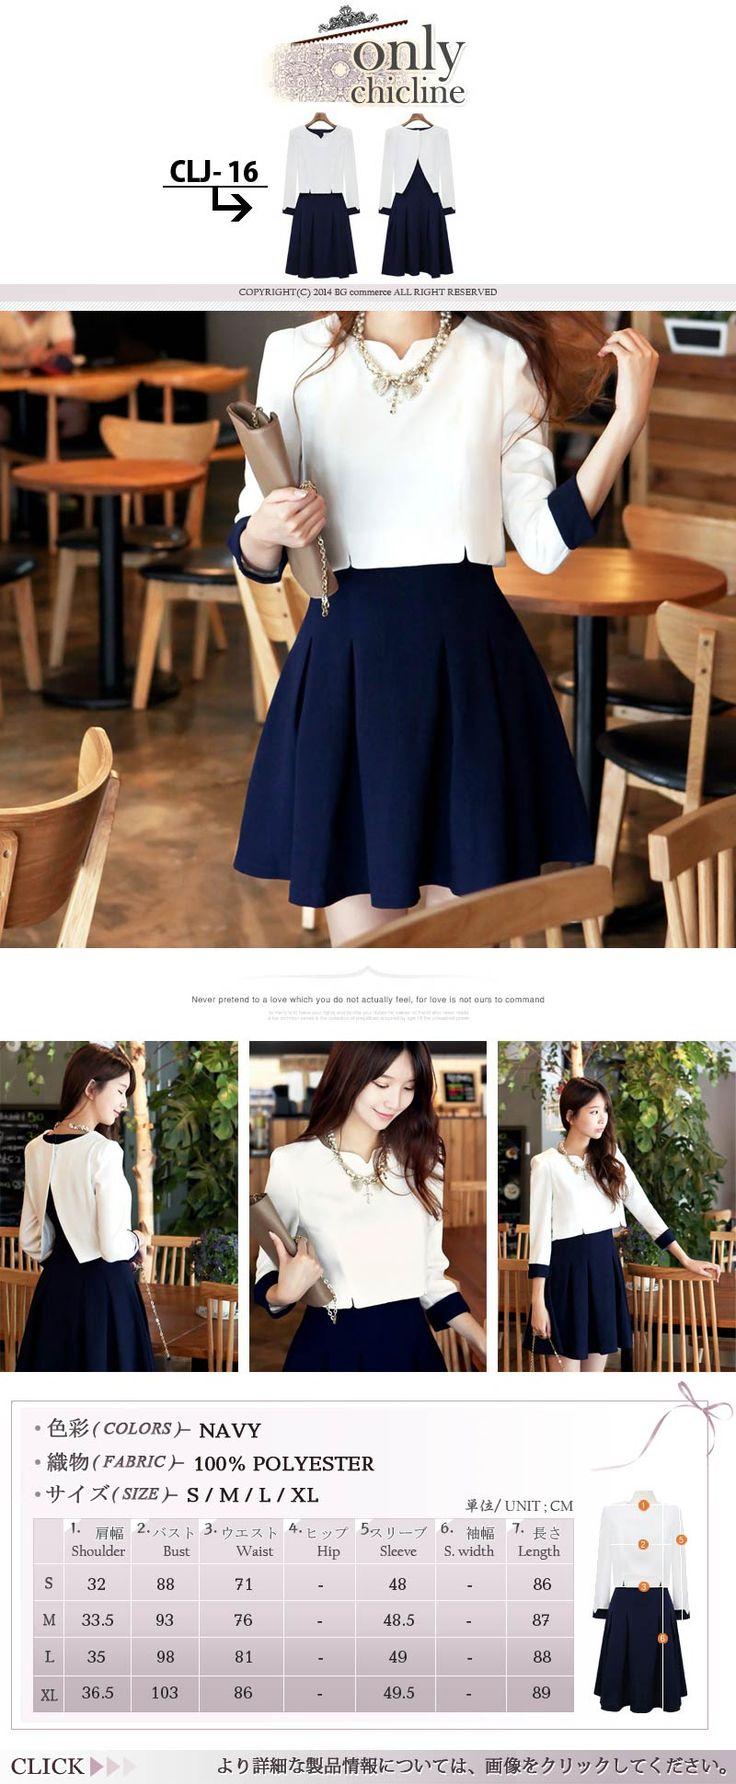 Black dress qoo10 - Http List Qoo10 Jp Gmkt Inc Goods